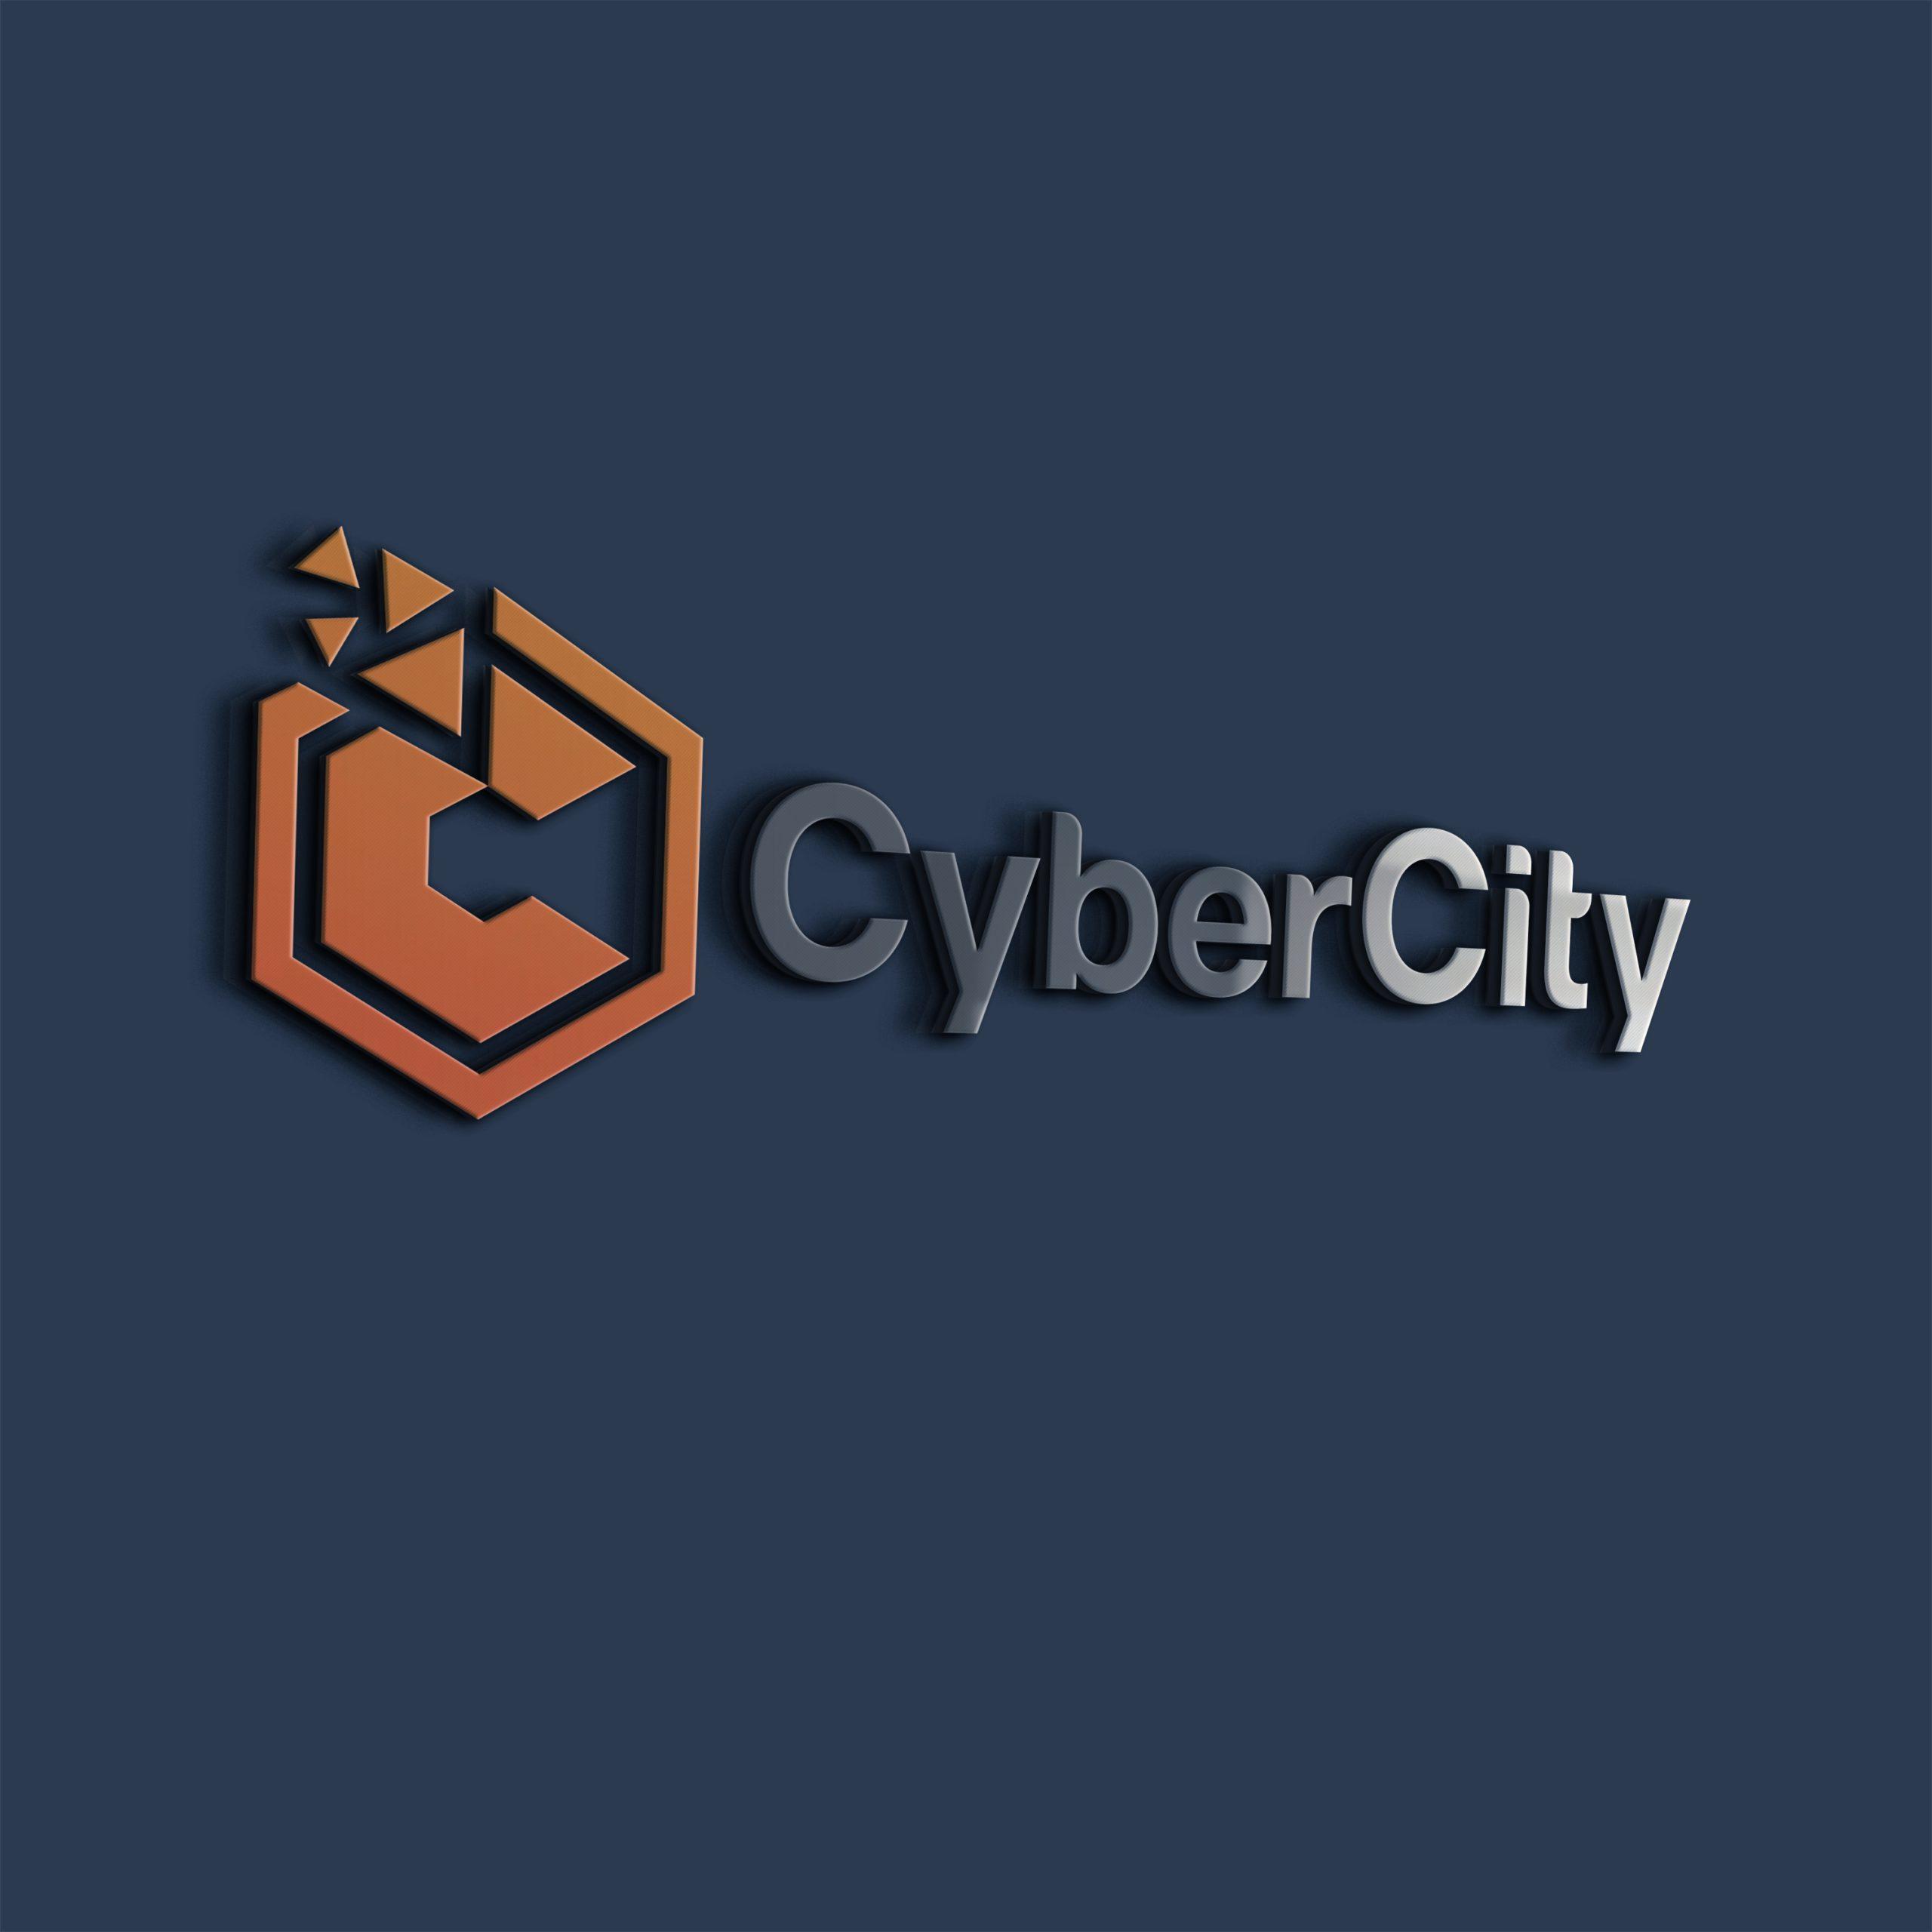 Logo - CyberCity (Mockup)